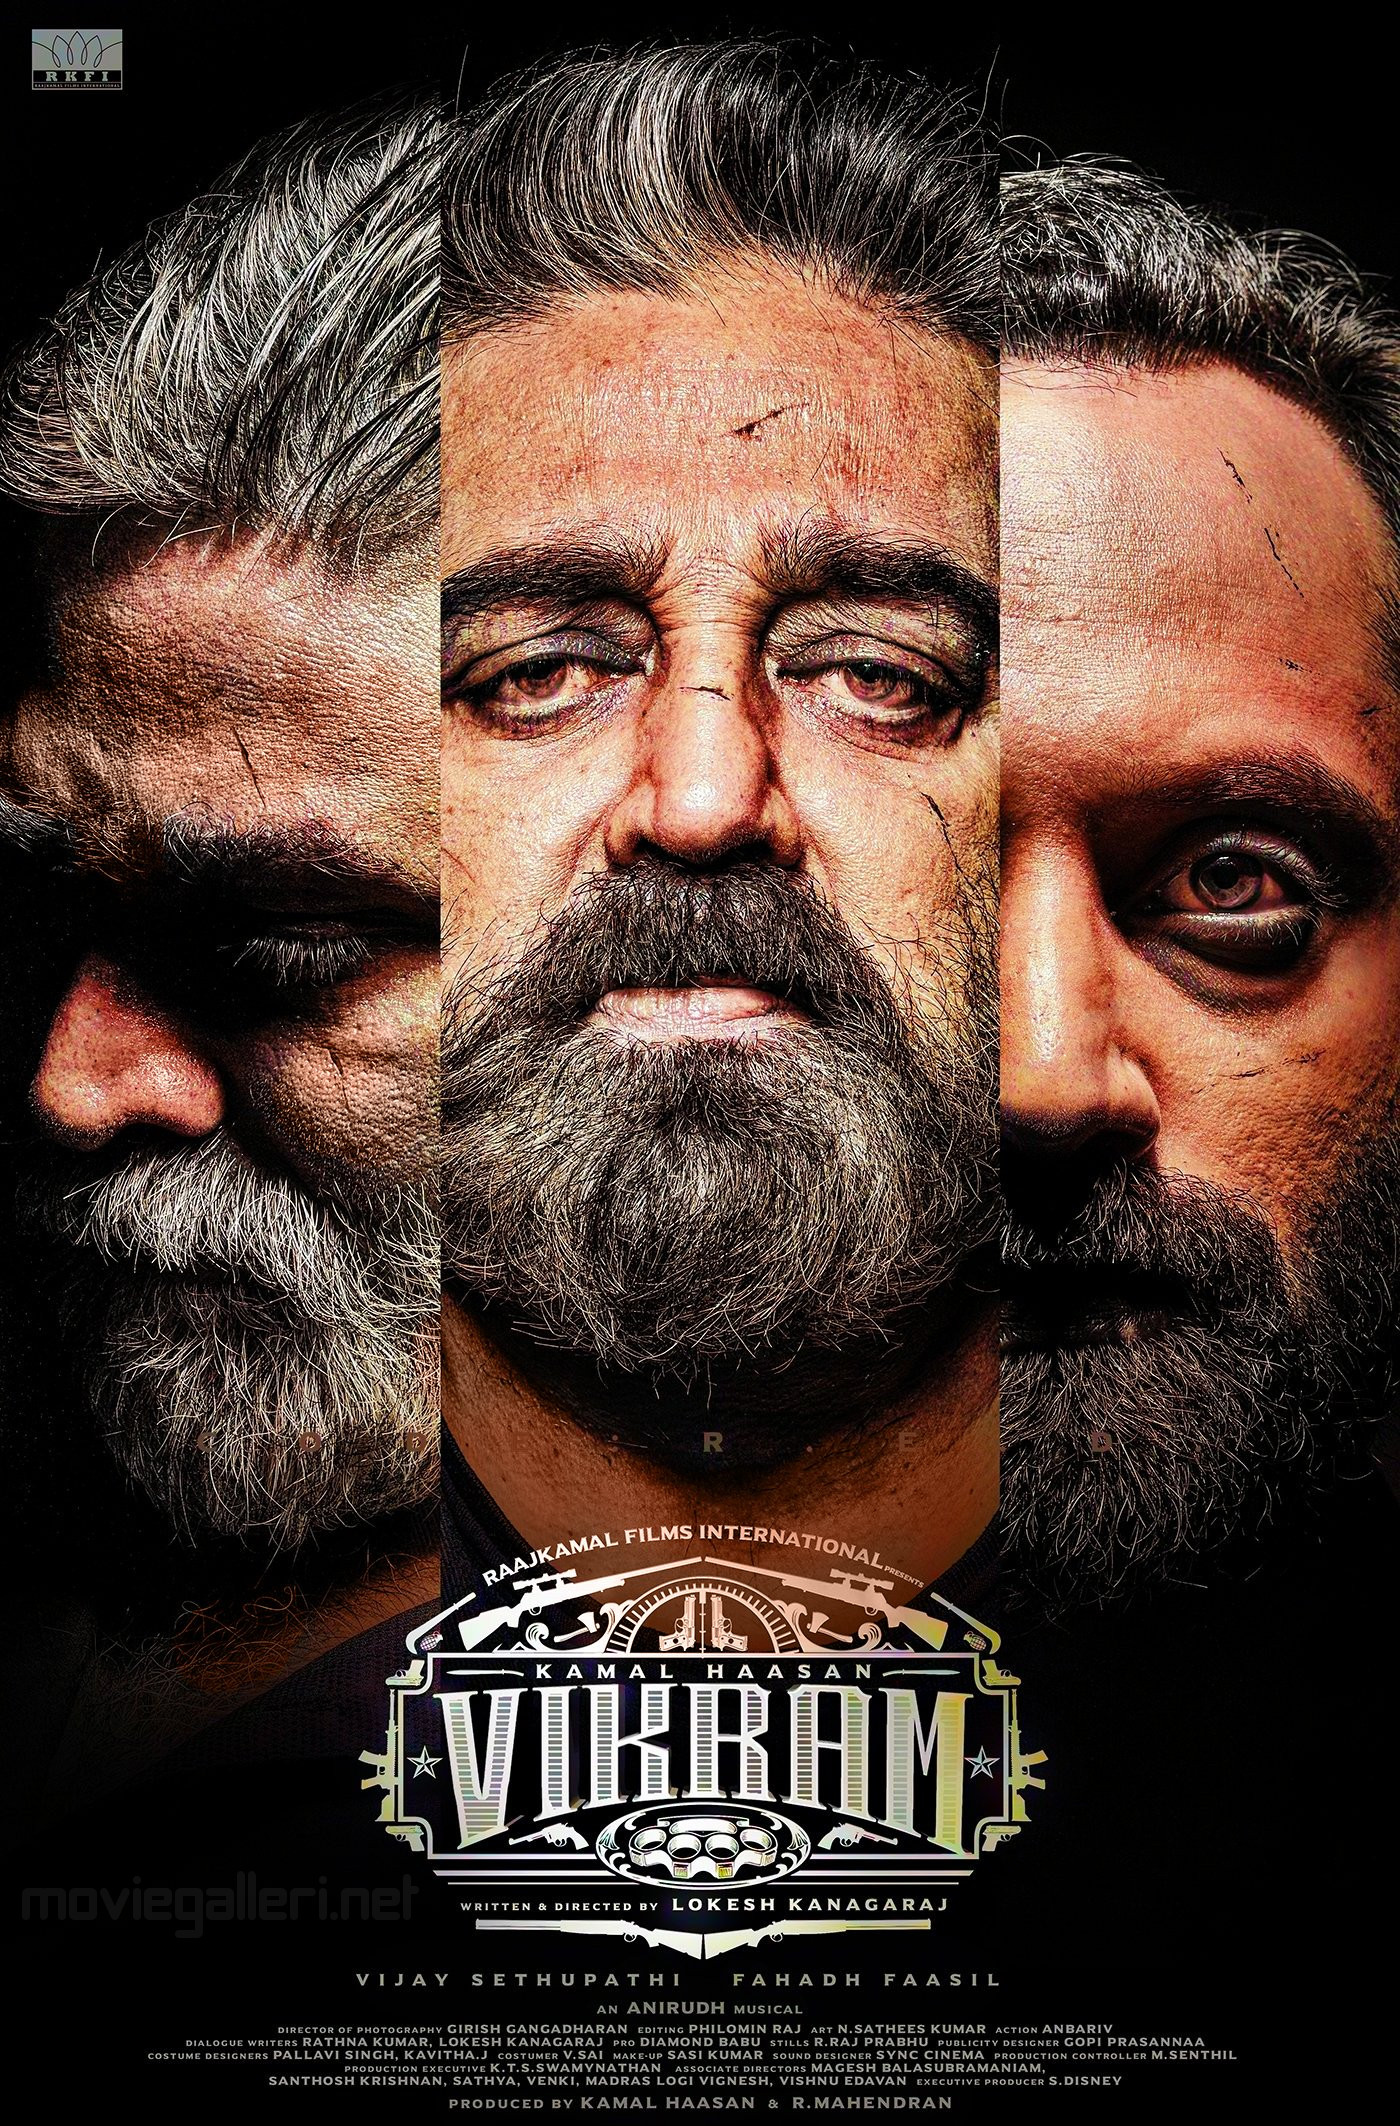 Vijay Sethupathi Kamal Fahadh Faasil Vikram Movie First Look Poster HD